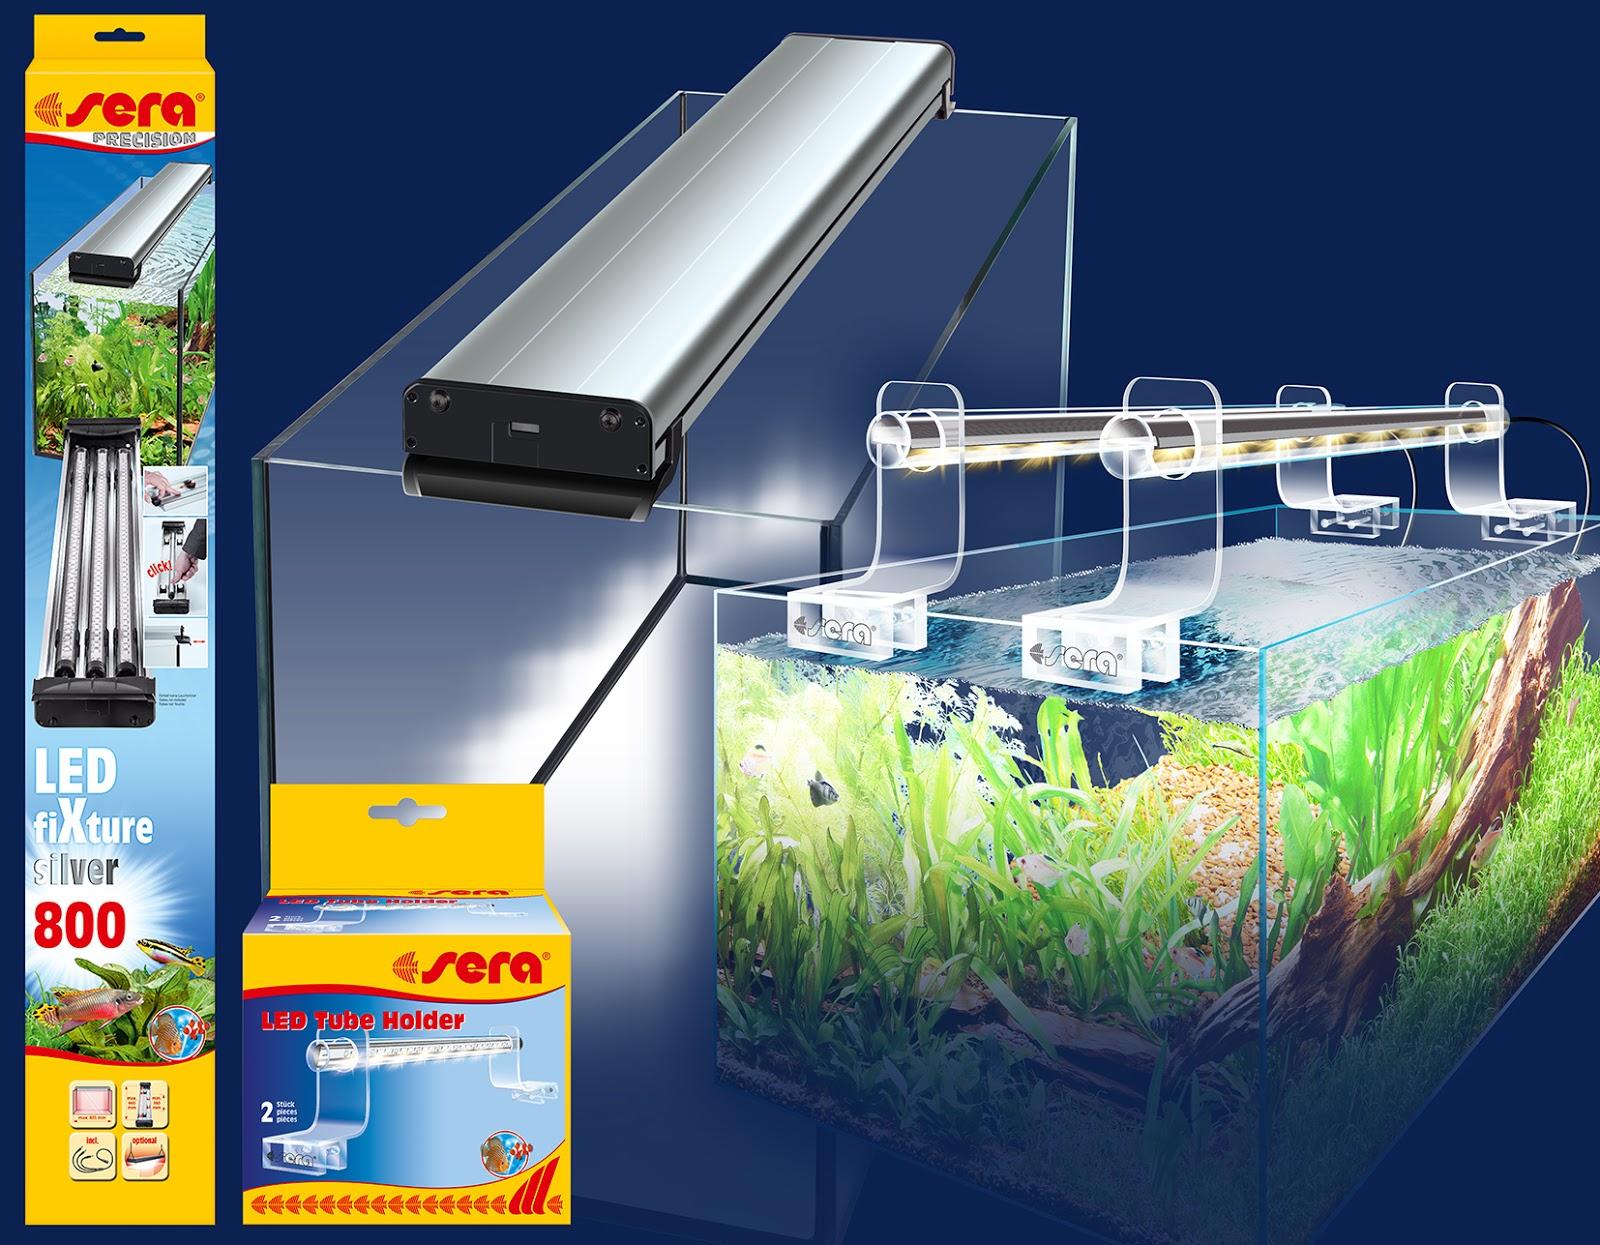 Aquamag sera pr sente sa gamme de supports pour for Aquarium ouvert